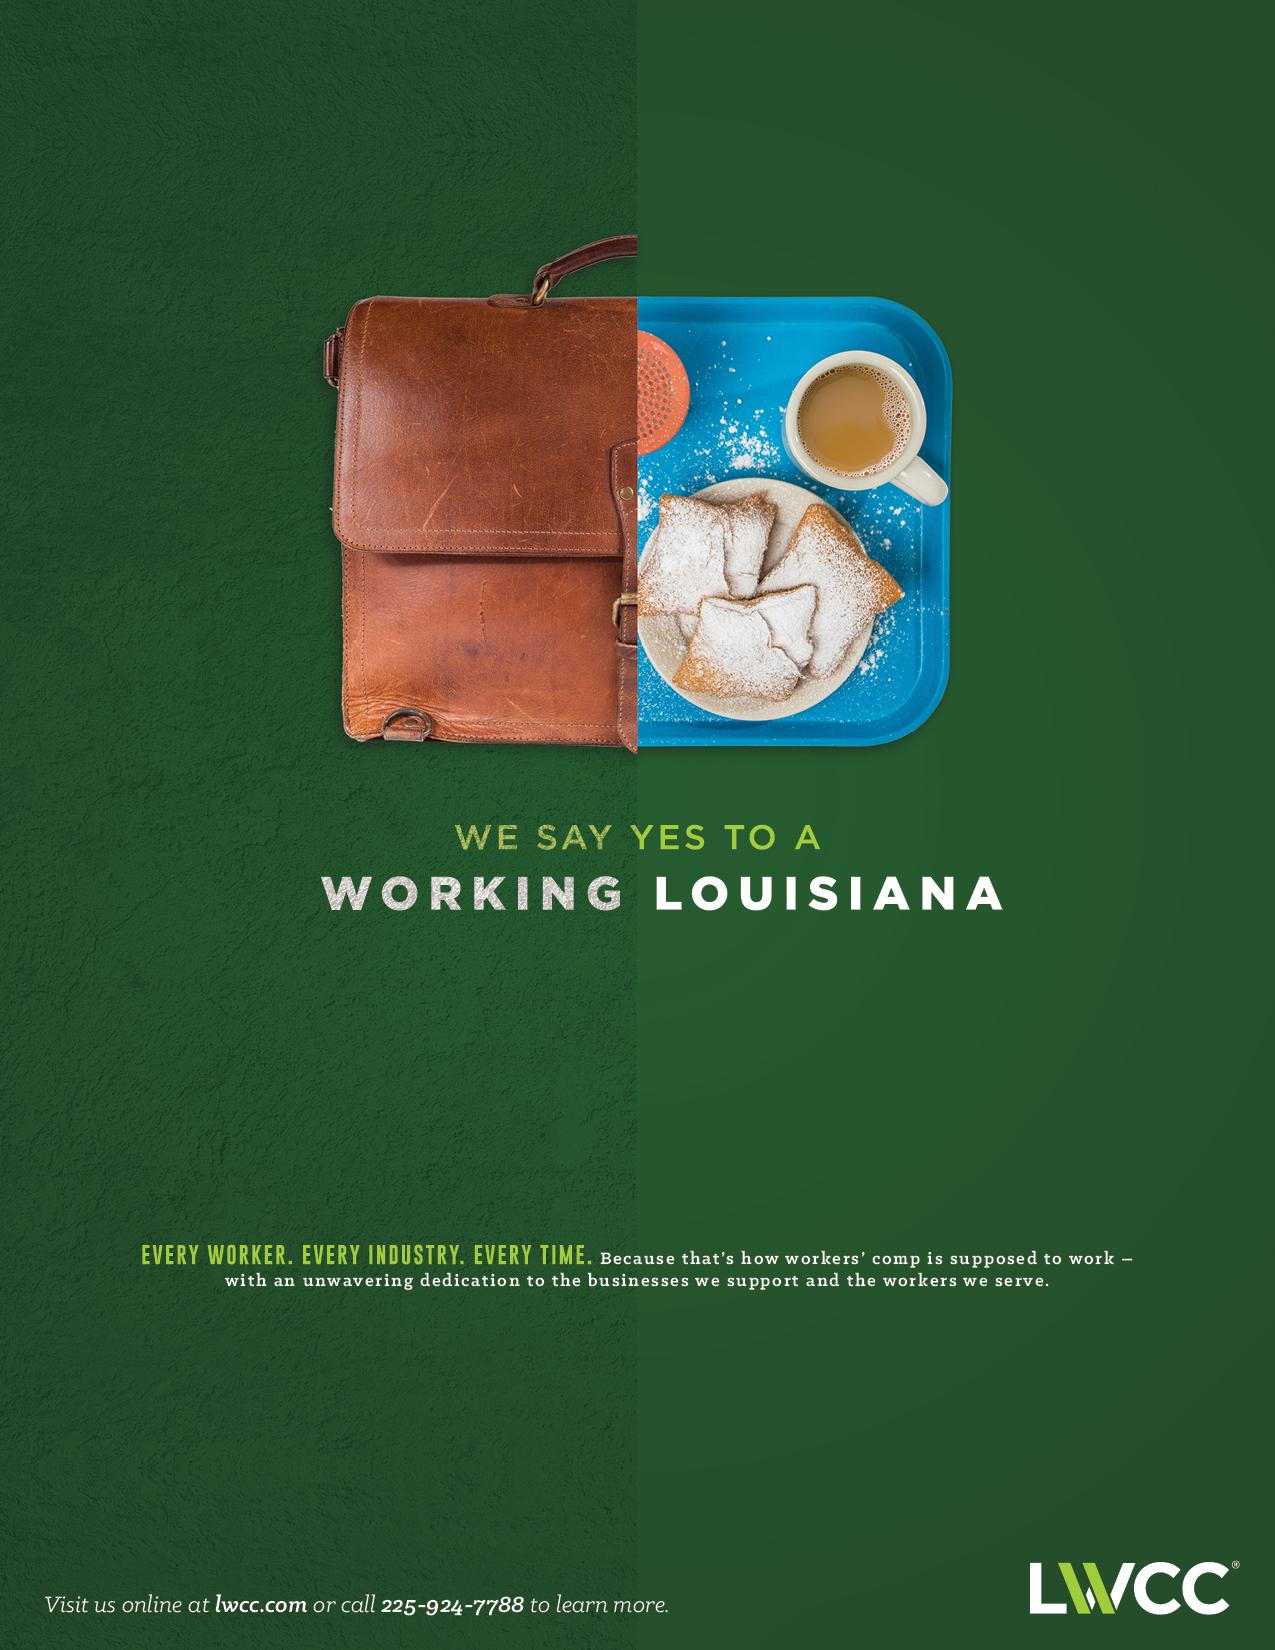 LWCC: 2016 Print Ad — Working